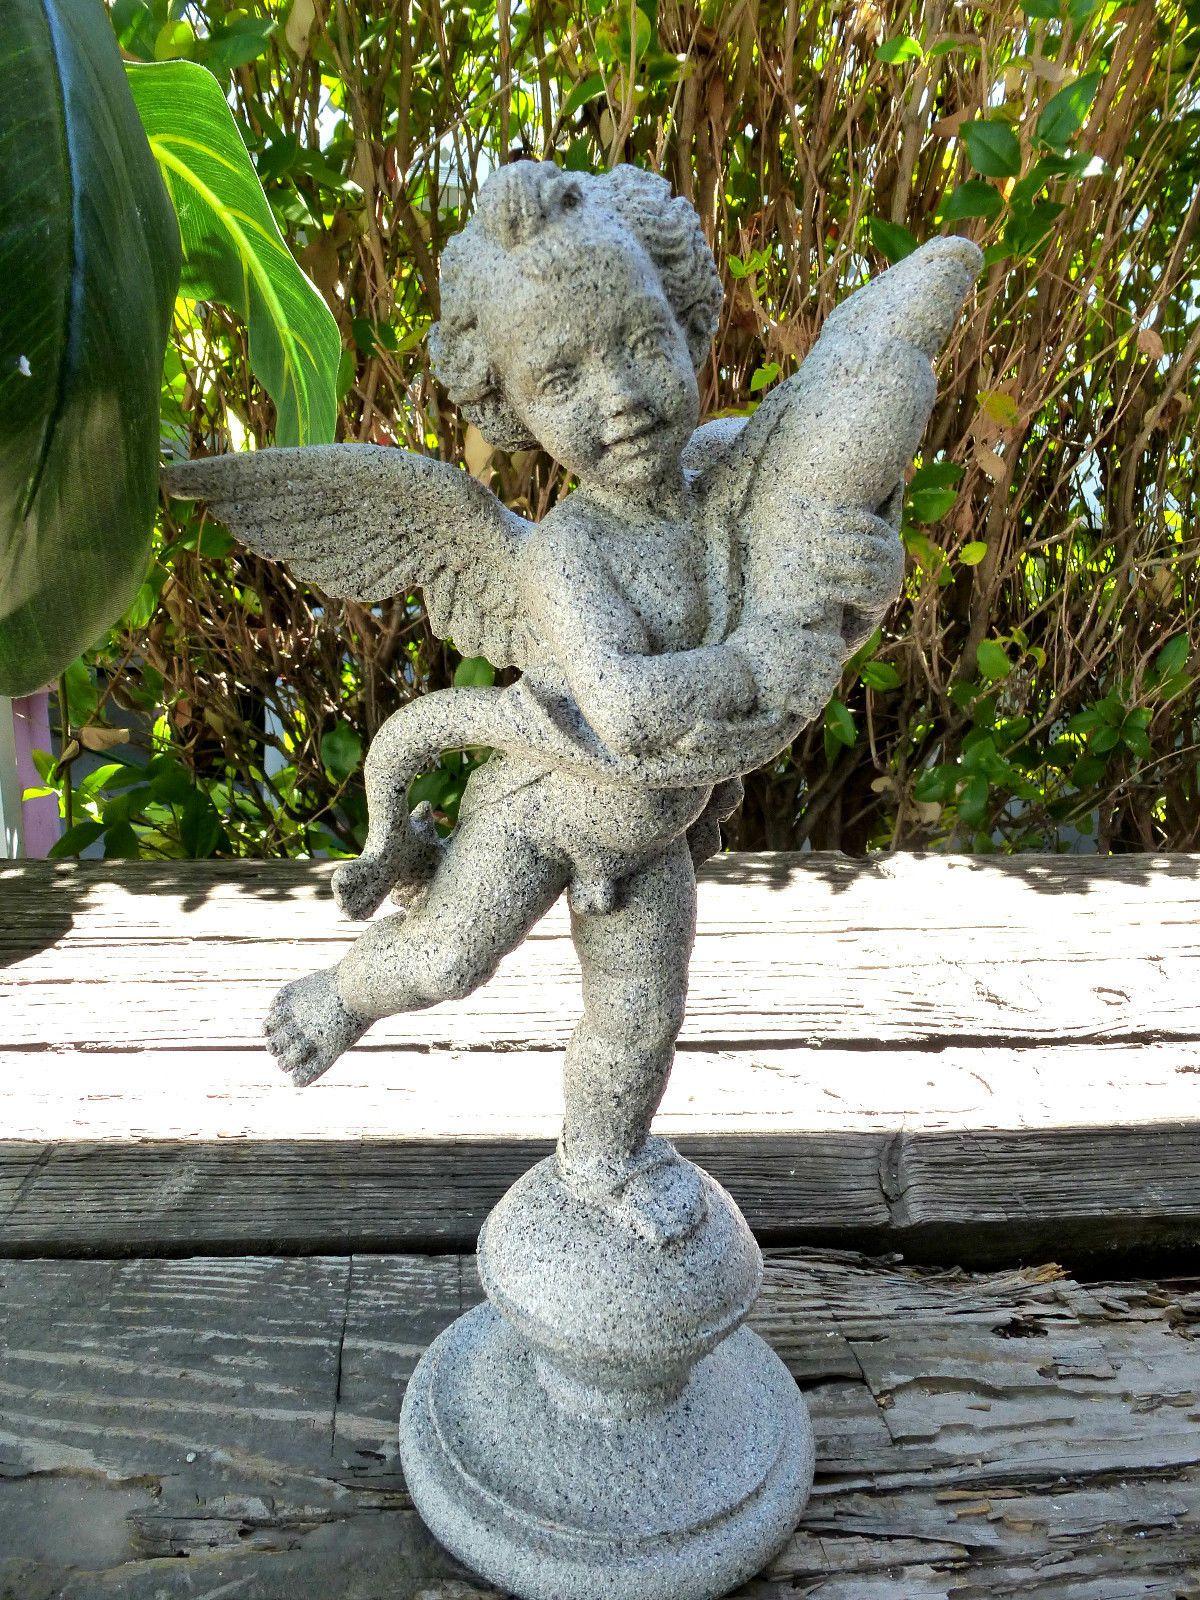 Charmant Vintage Older Small GARDEN STATUE CHERUB WITH DOLPHIN Fish Child Figure |  EBay